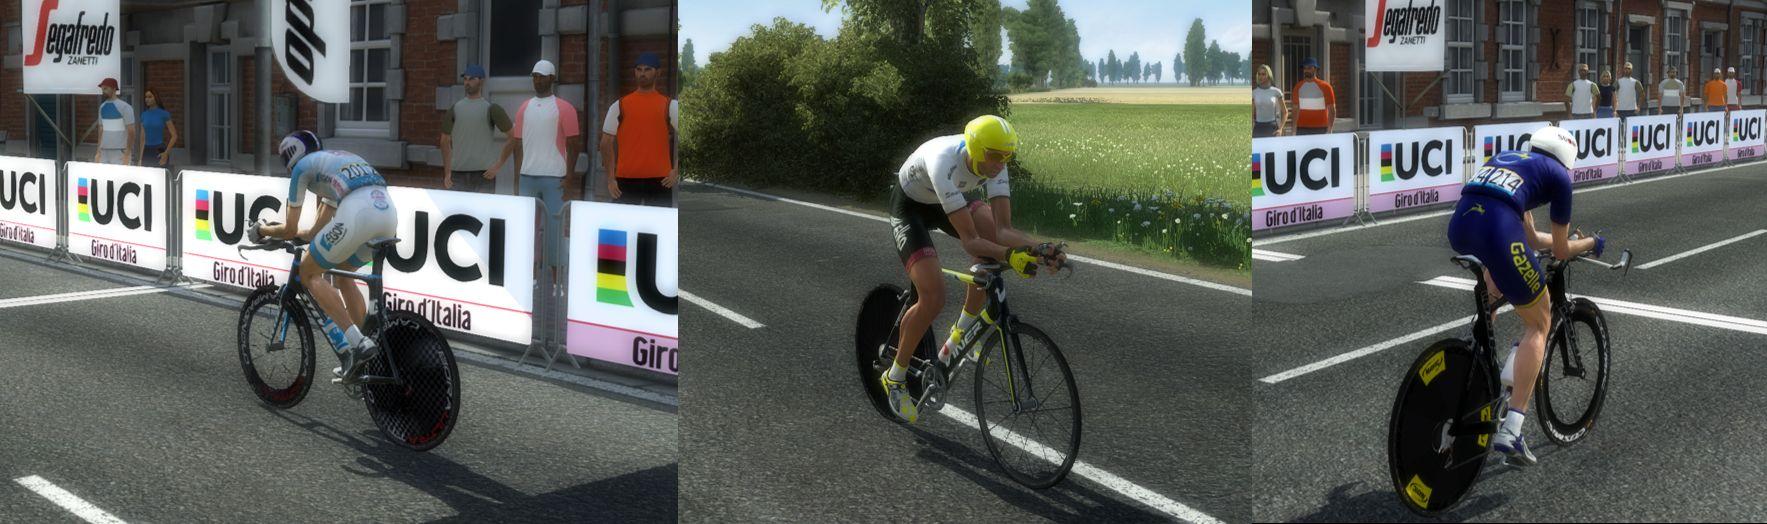 pcmdaily.com/images/mg/2020/Reports/GTM/Giro/S14/mg20_giro_s14_63.jpg